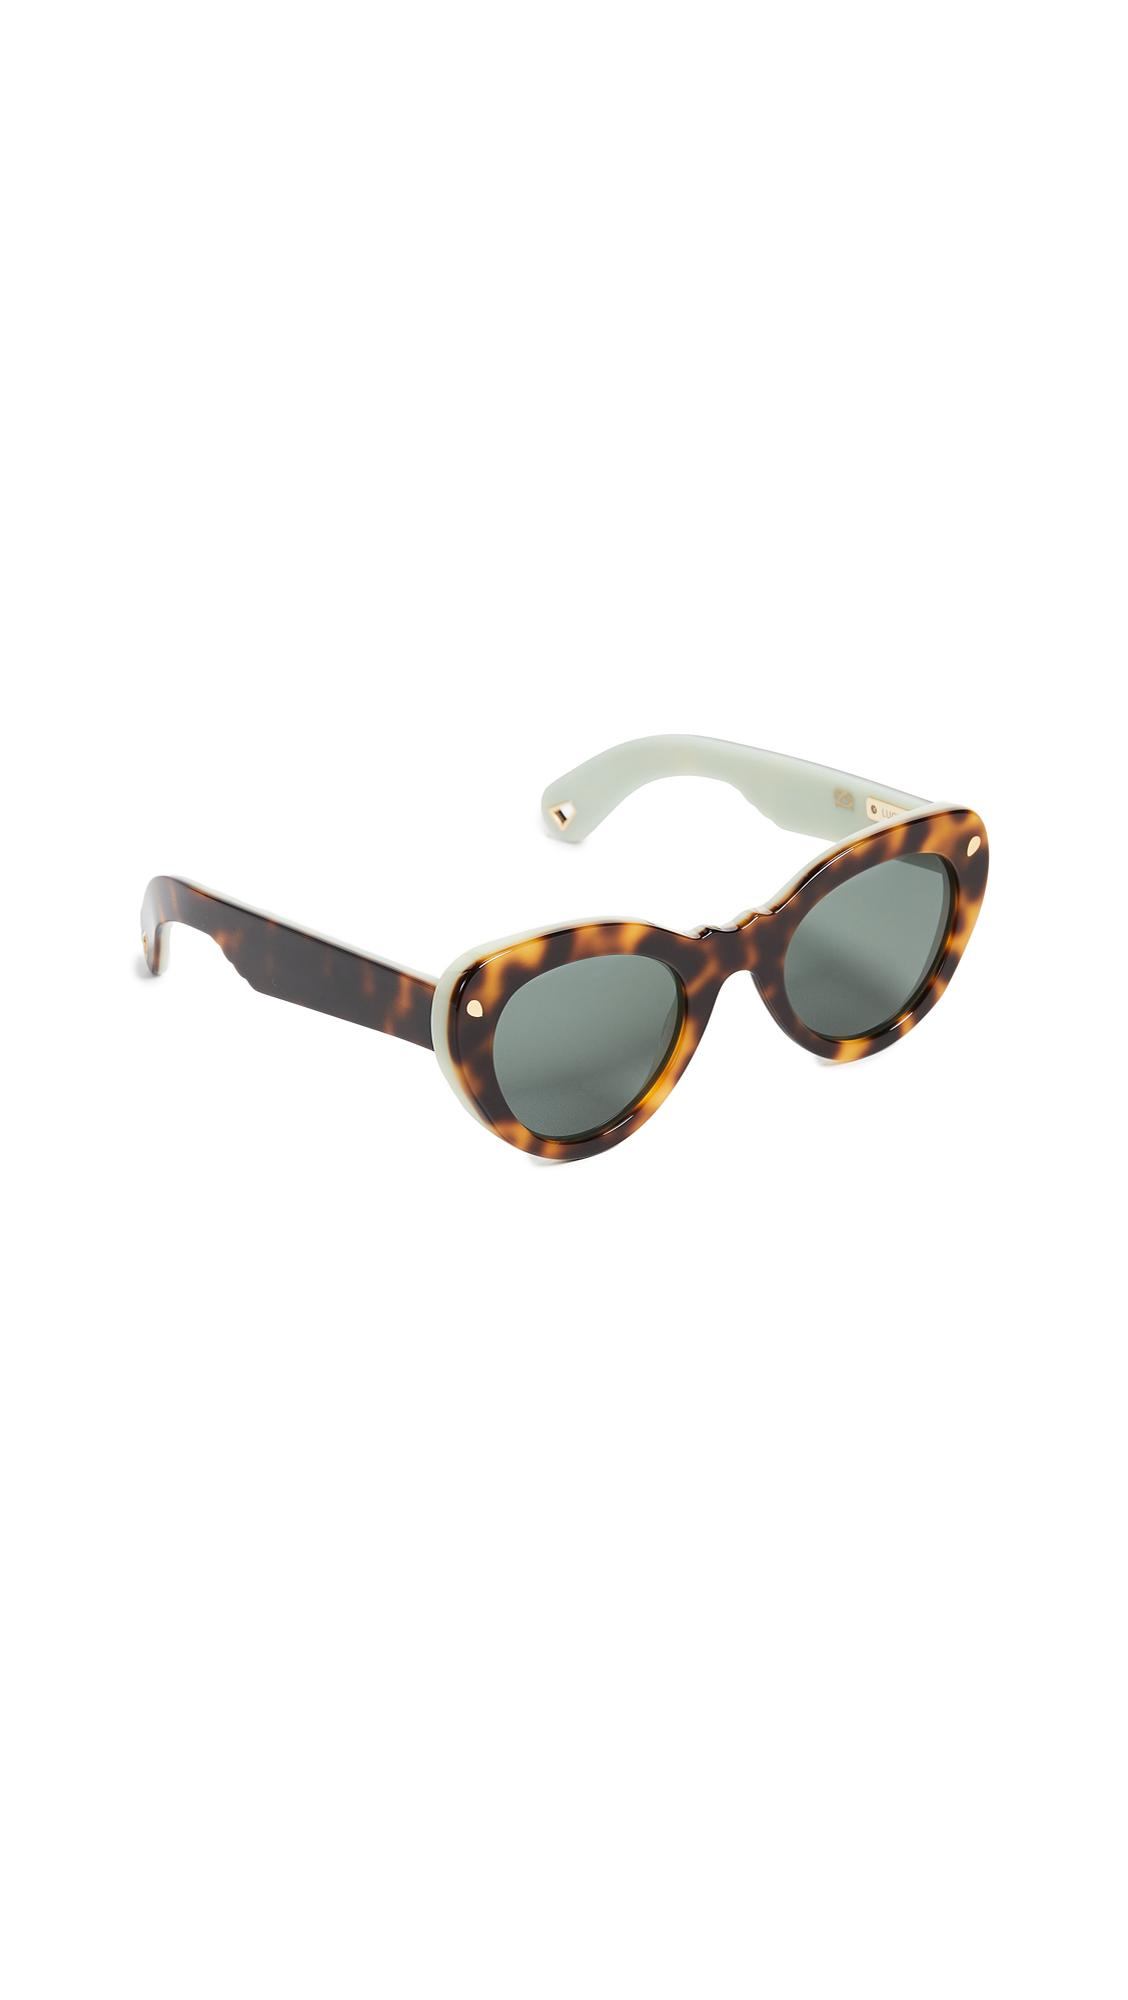 e88ce6a2c30 Lucy Folk Wingspan Sunglasses